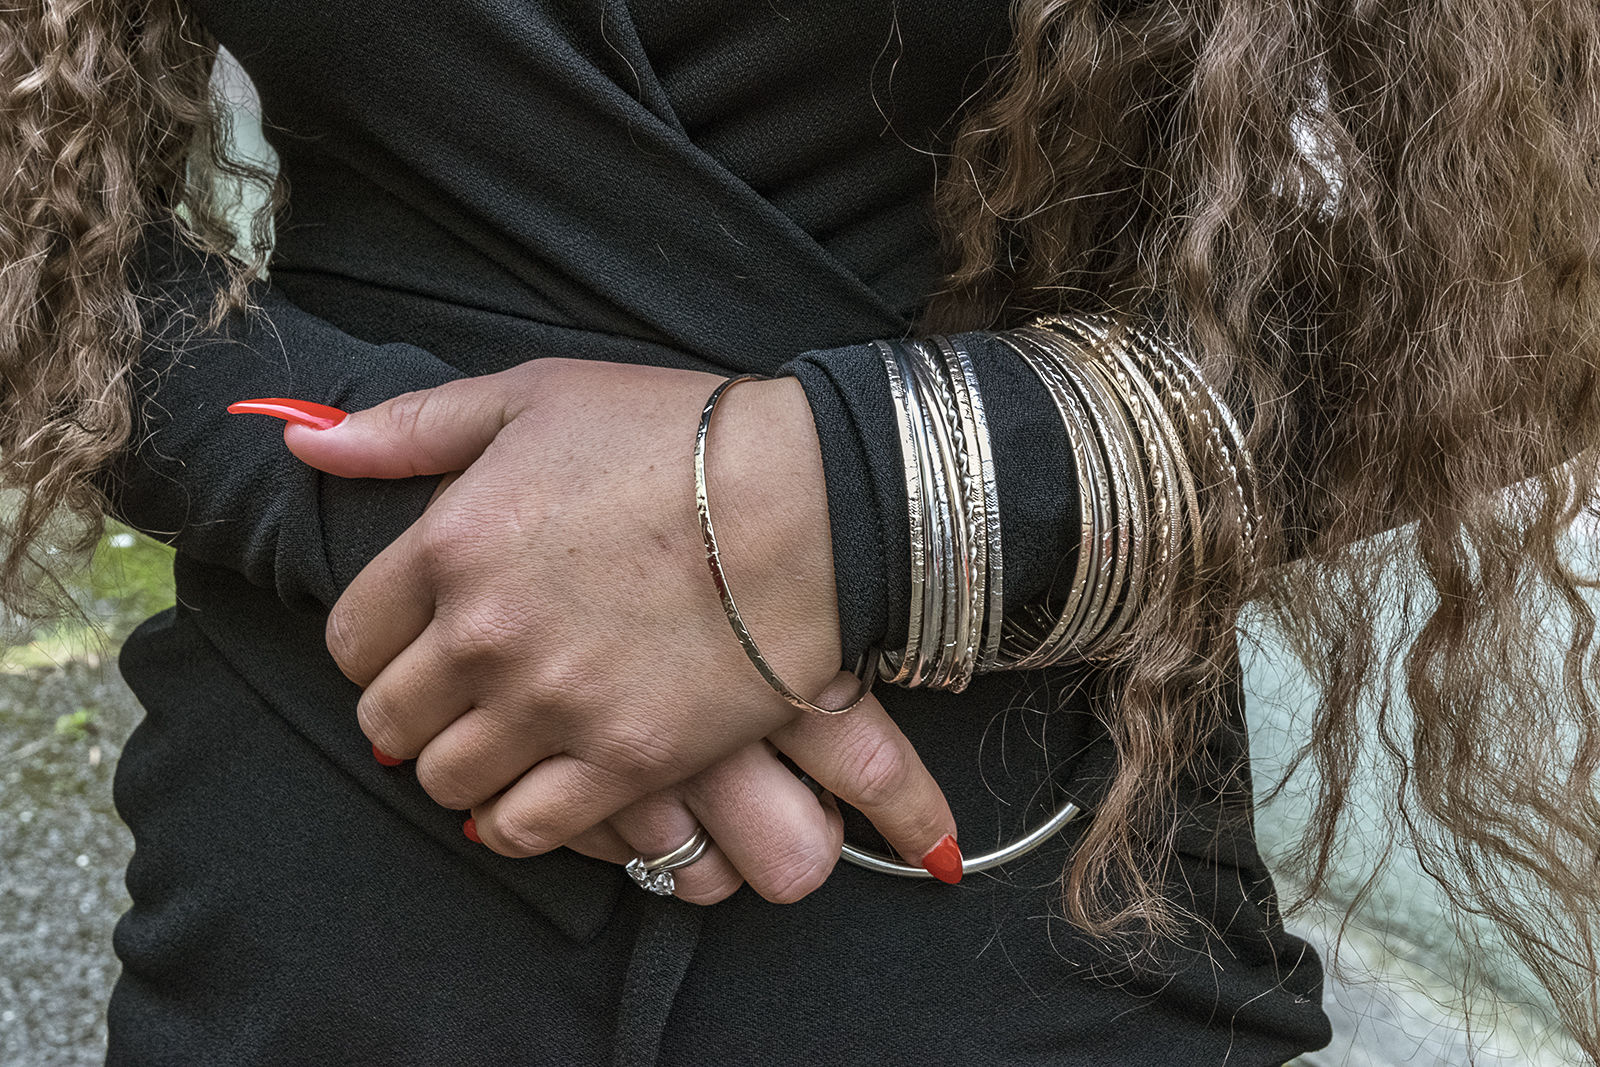 Bracelets, Galway, Ireland 2018